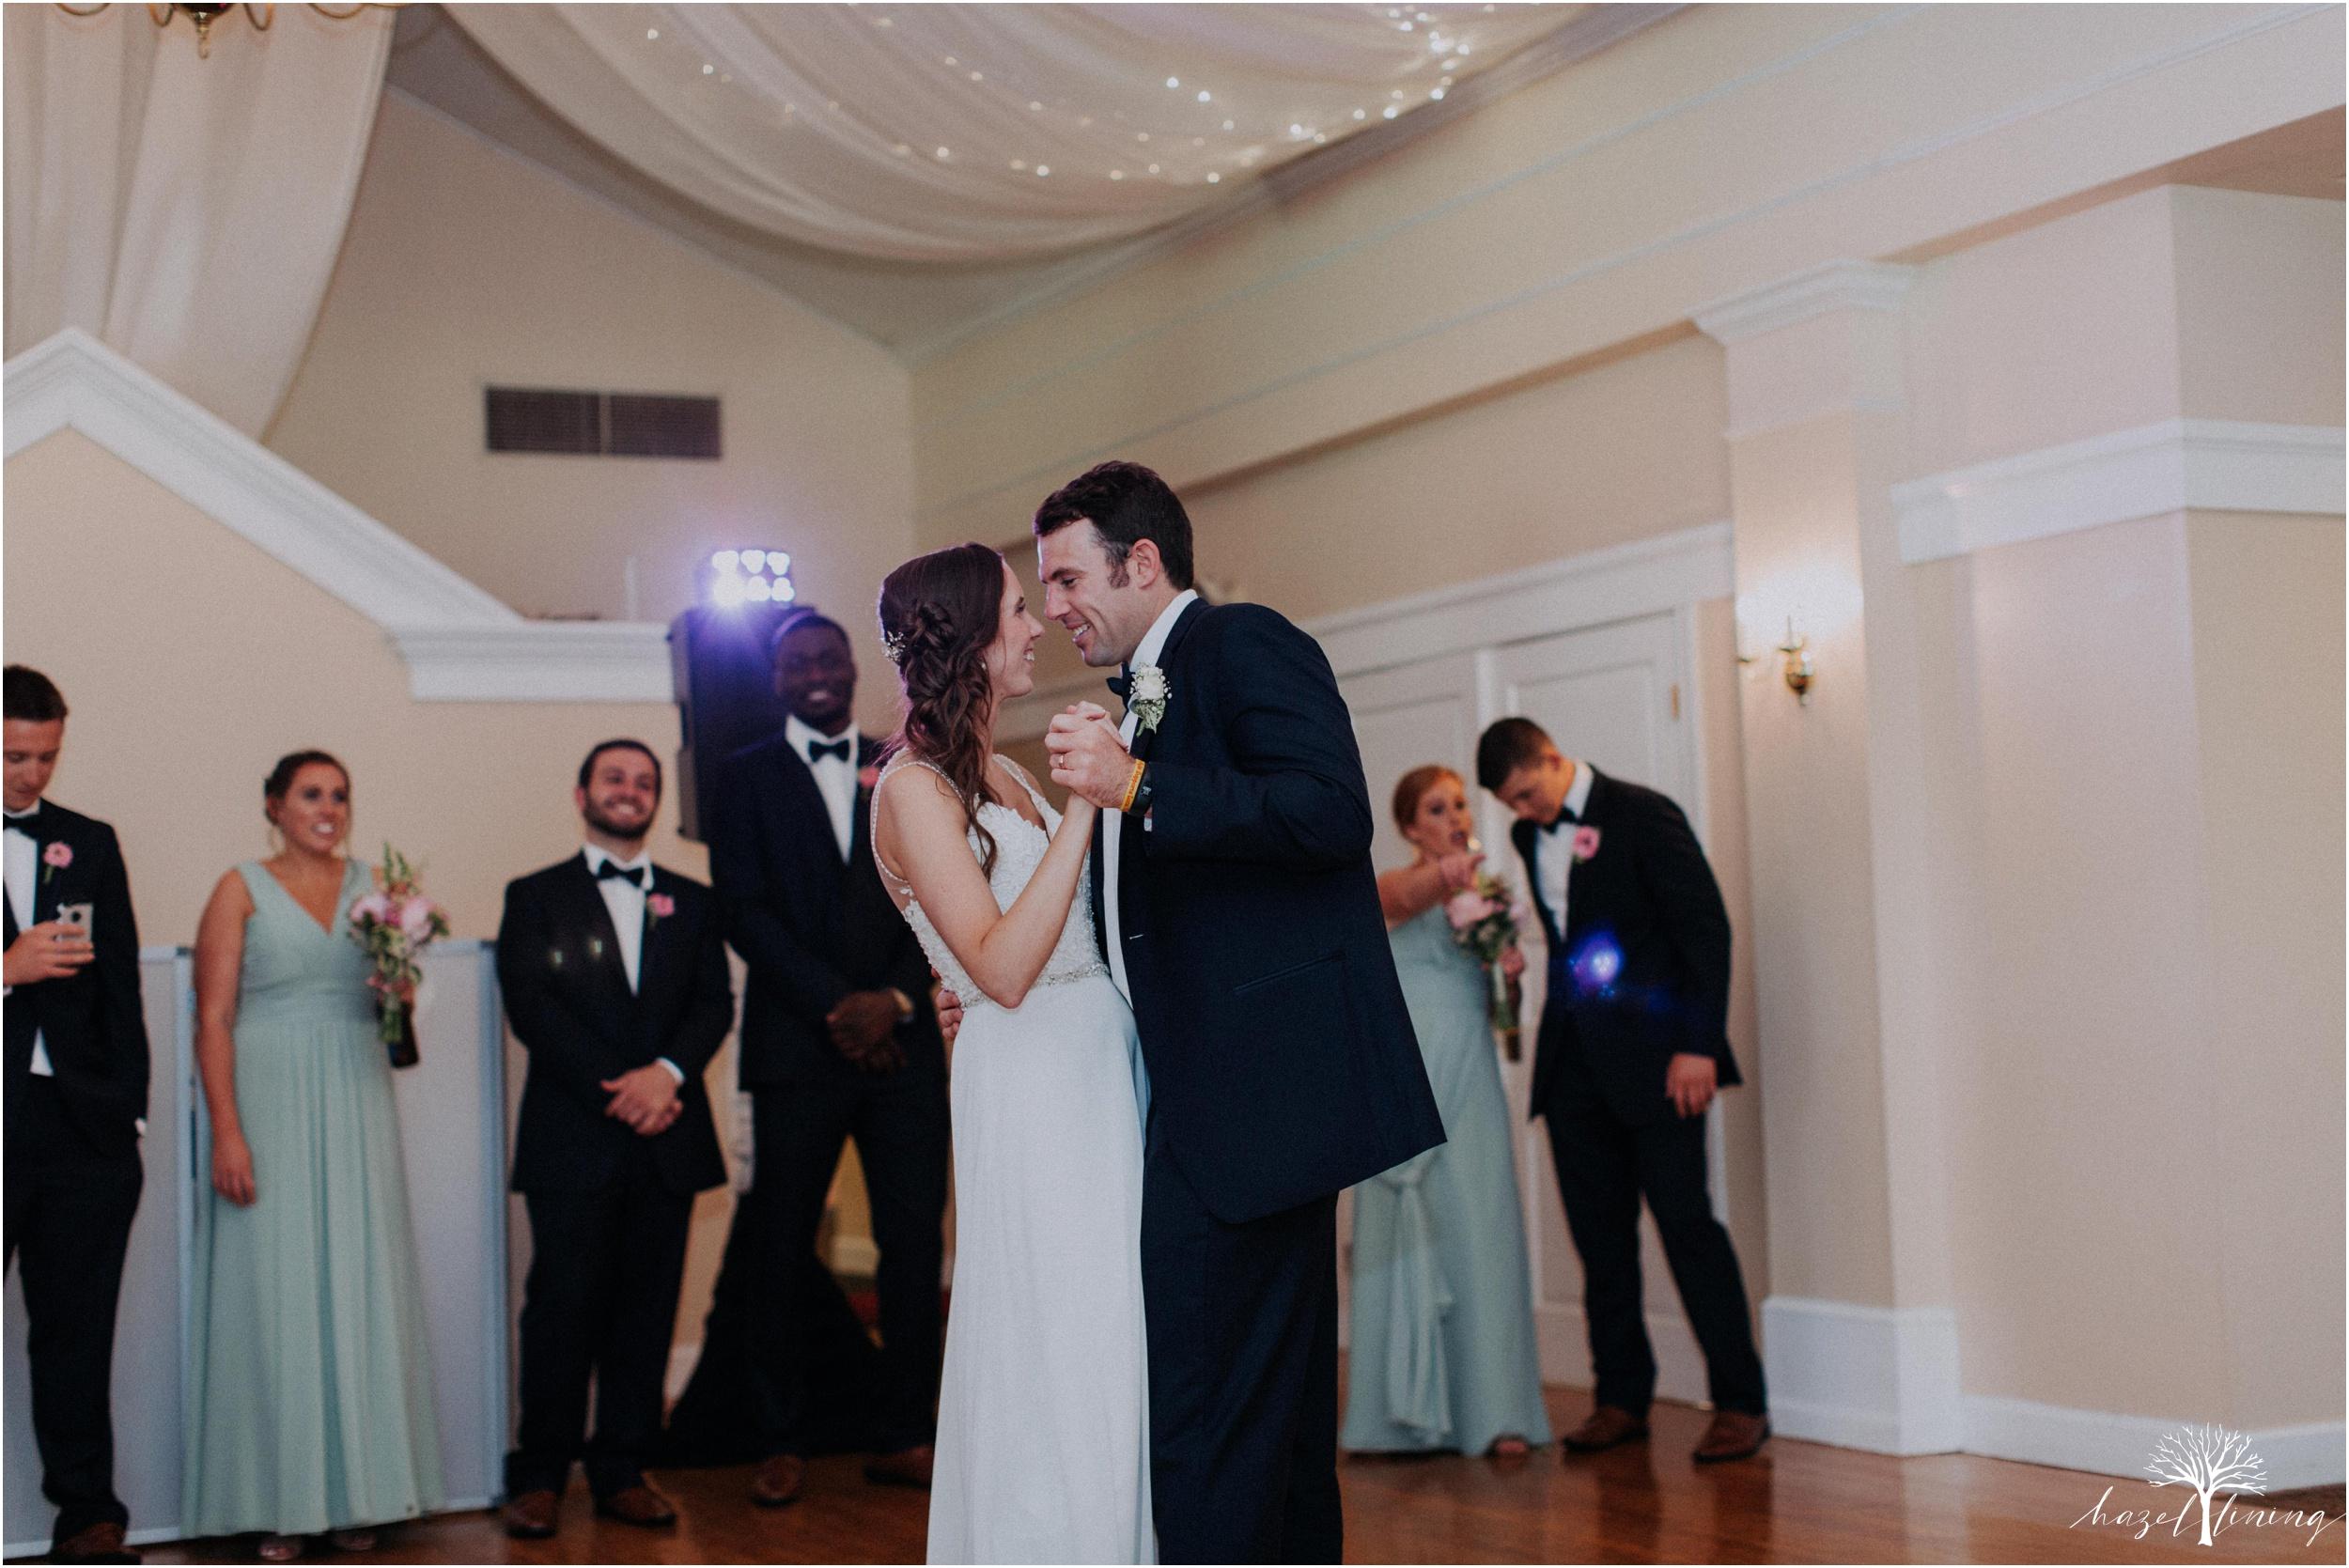 hazel-lining-travel-wedding-elopement-photography_0135.jpg